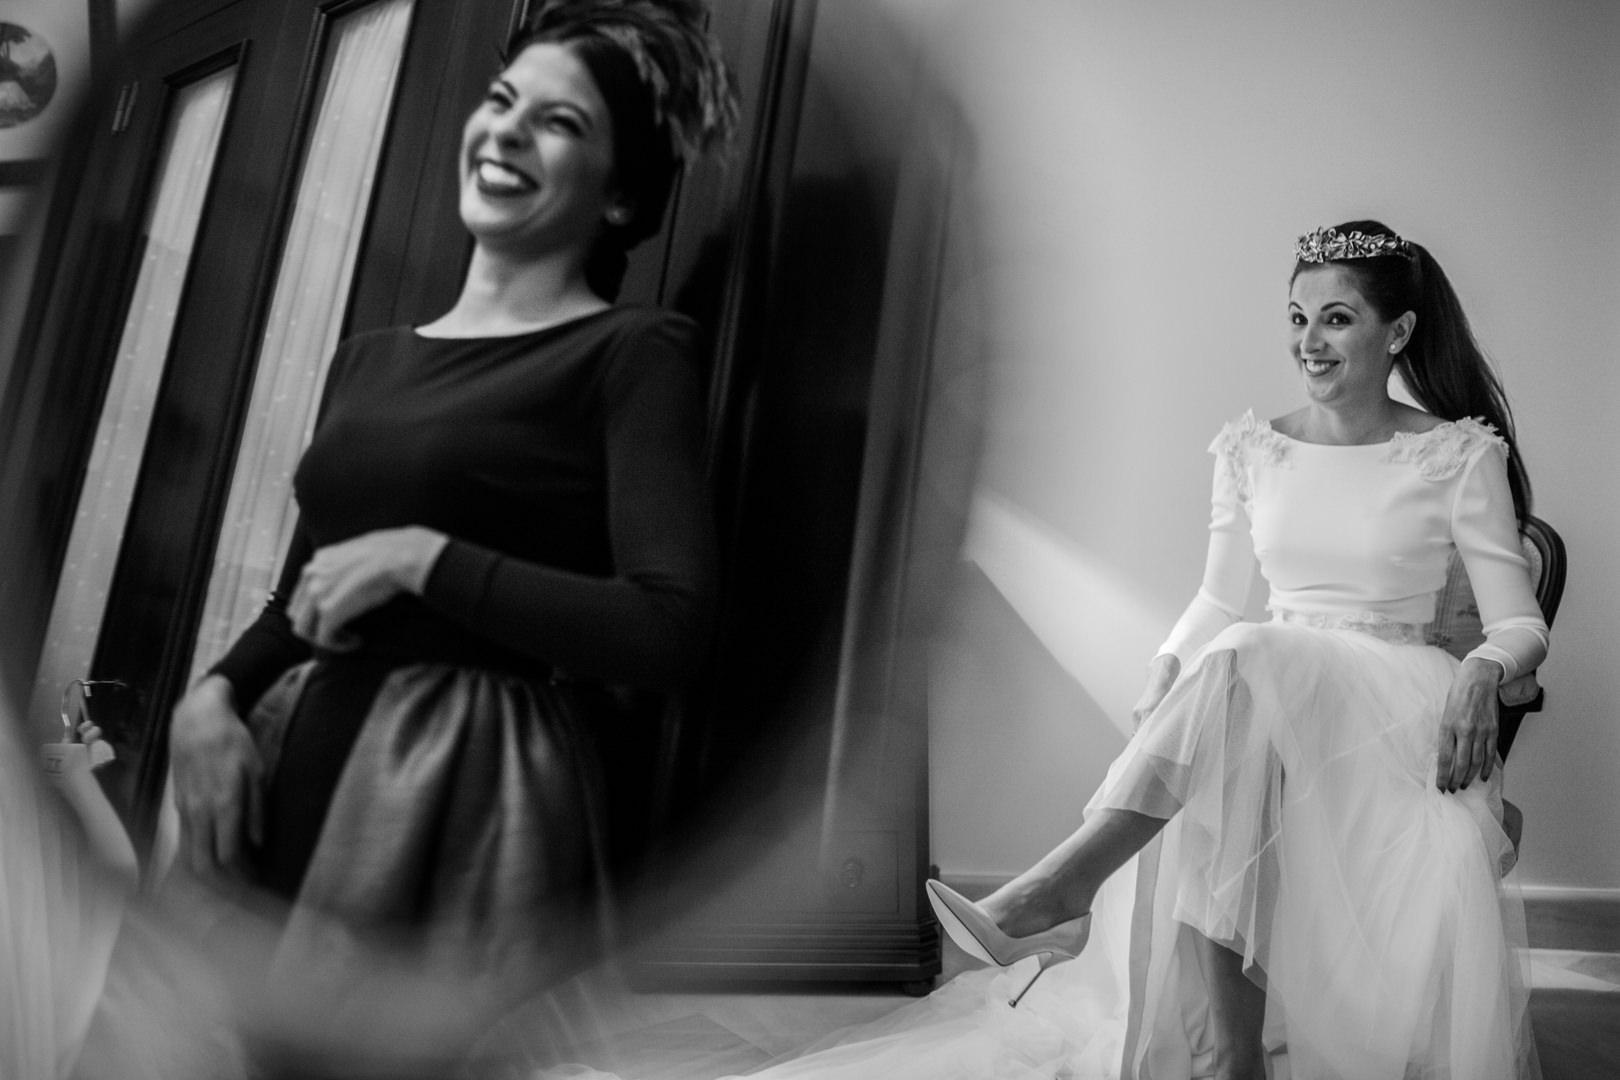 Boda-sevilla-Wedding-engagement-Rafael-Torres-fotografo-bodas-sevilla-madrid-barcelona-wedding-photographer--12.jpg